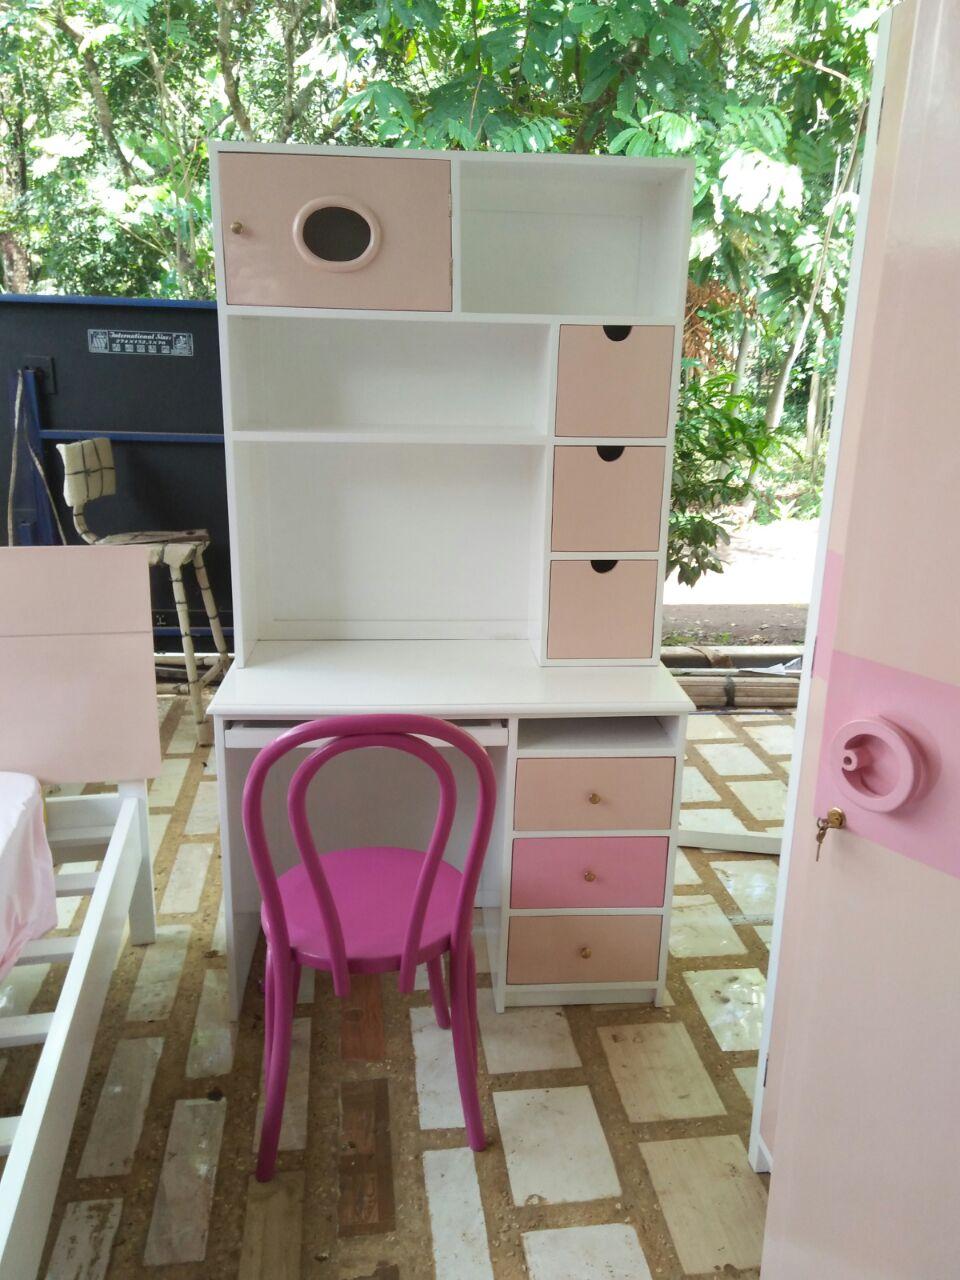 Meja-Belajar-Set-Ranjang-Tidur-Anak-Round-Pink Set Ranjang Tidur Anak Round Pink Jakarta - Pesanan Bu Sarah